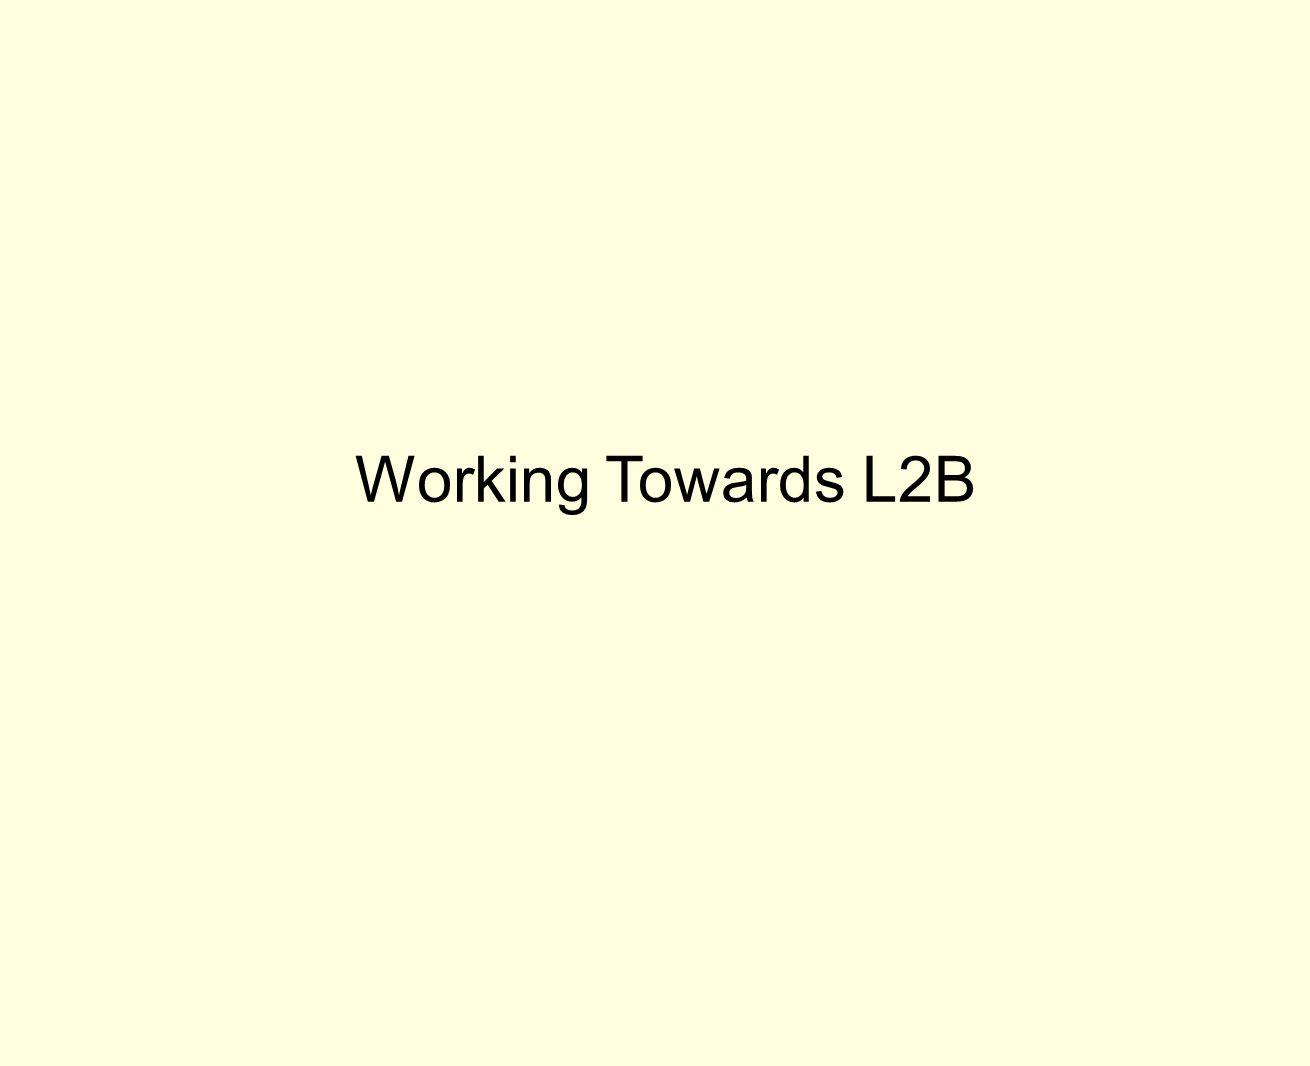 Working Towards L2B